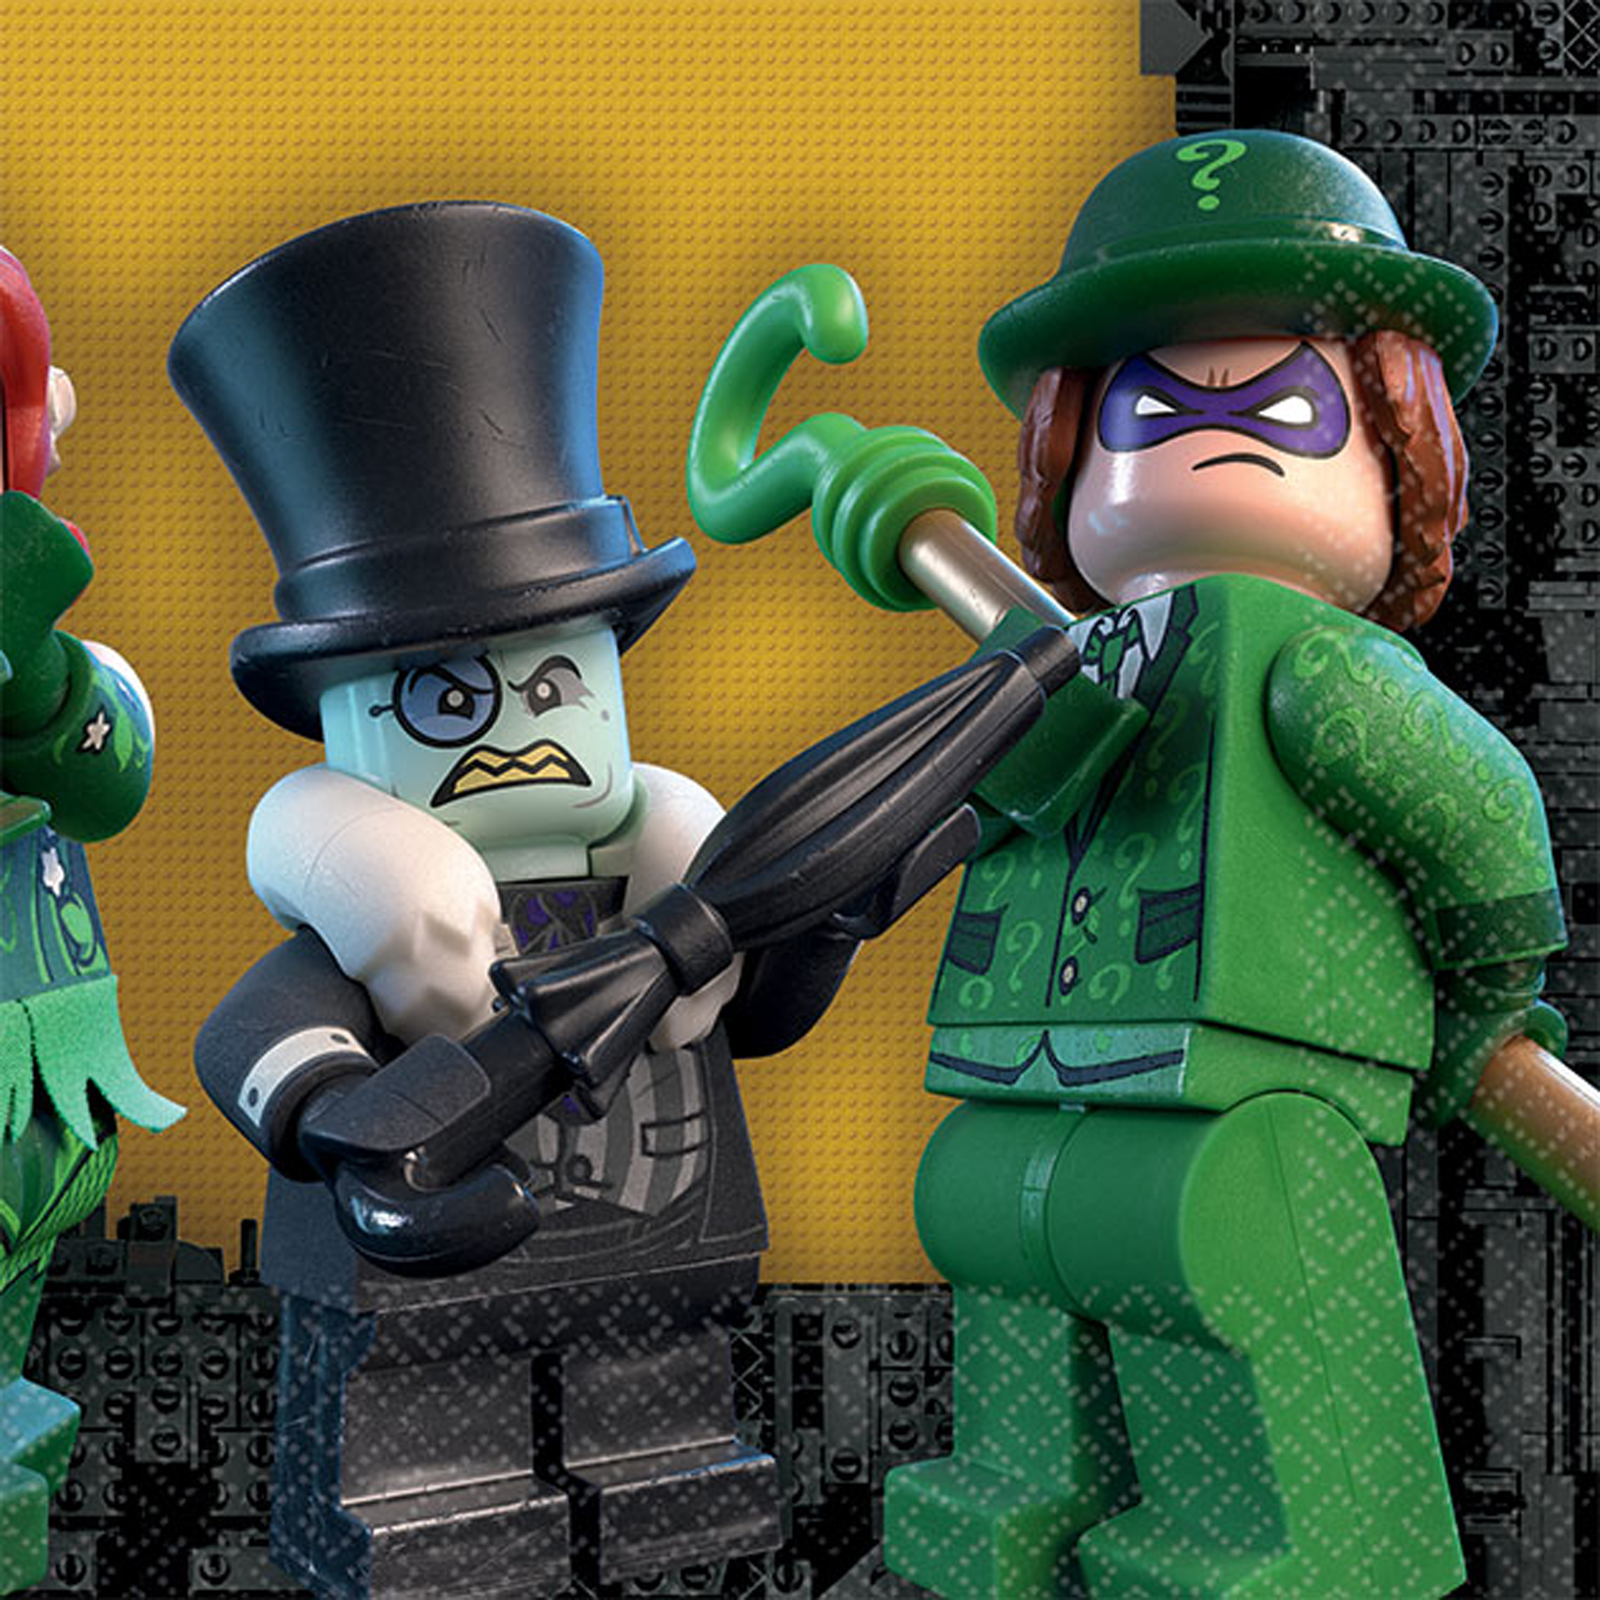 Lego Batman Beverage Napkins (16 Count)